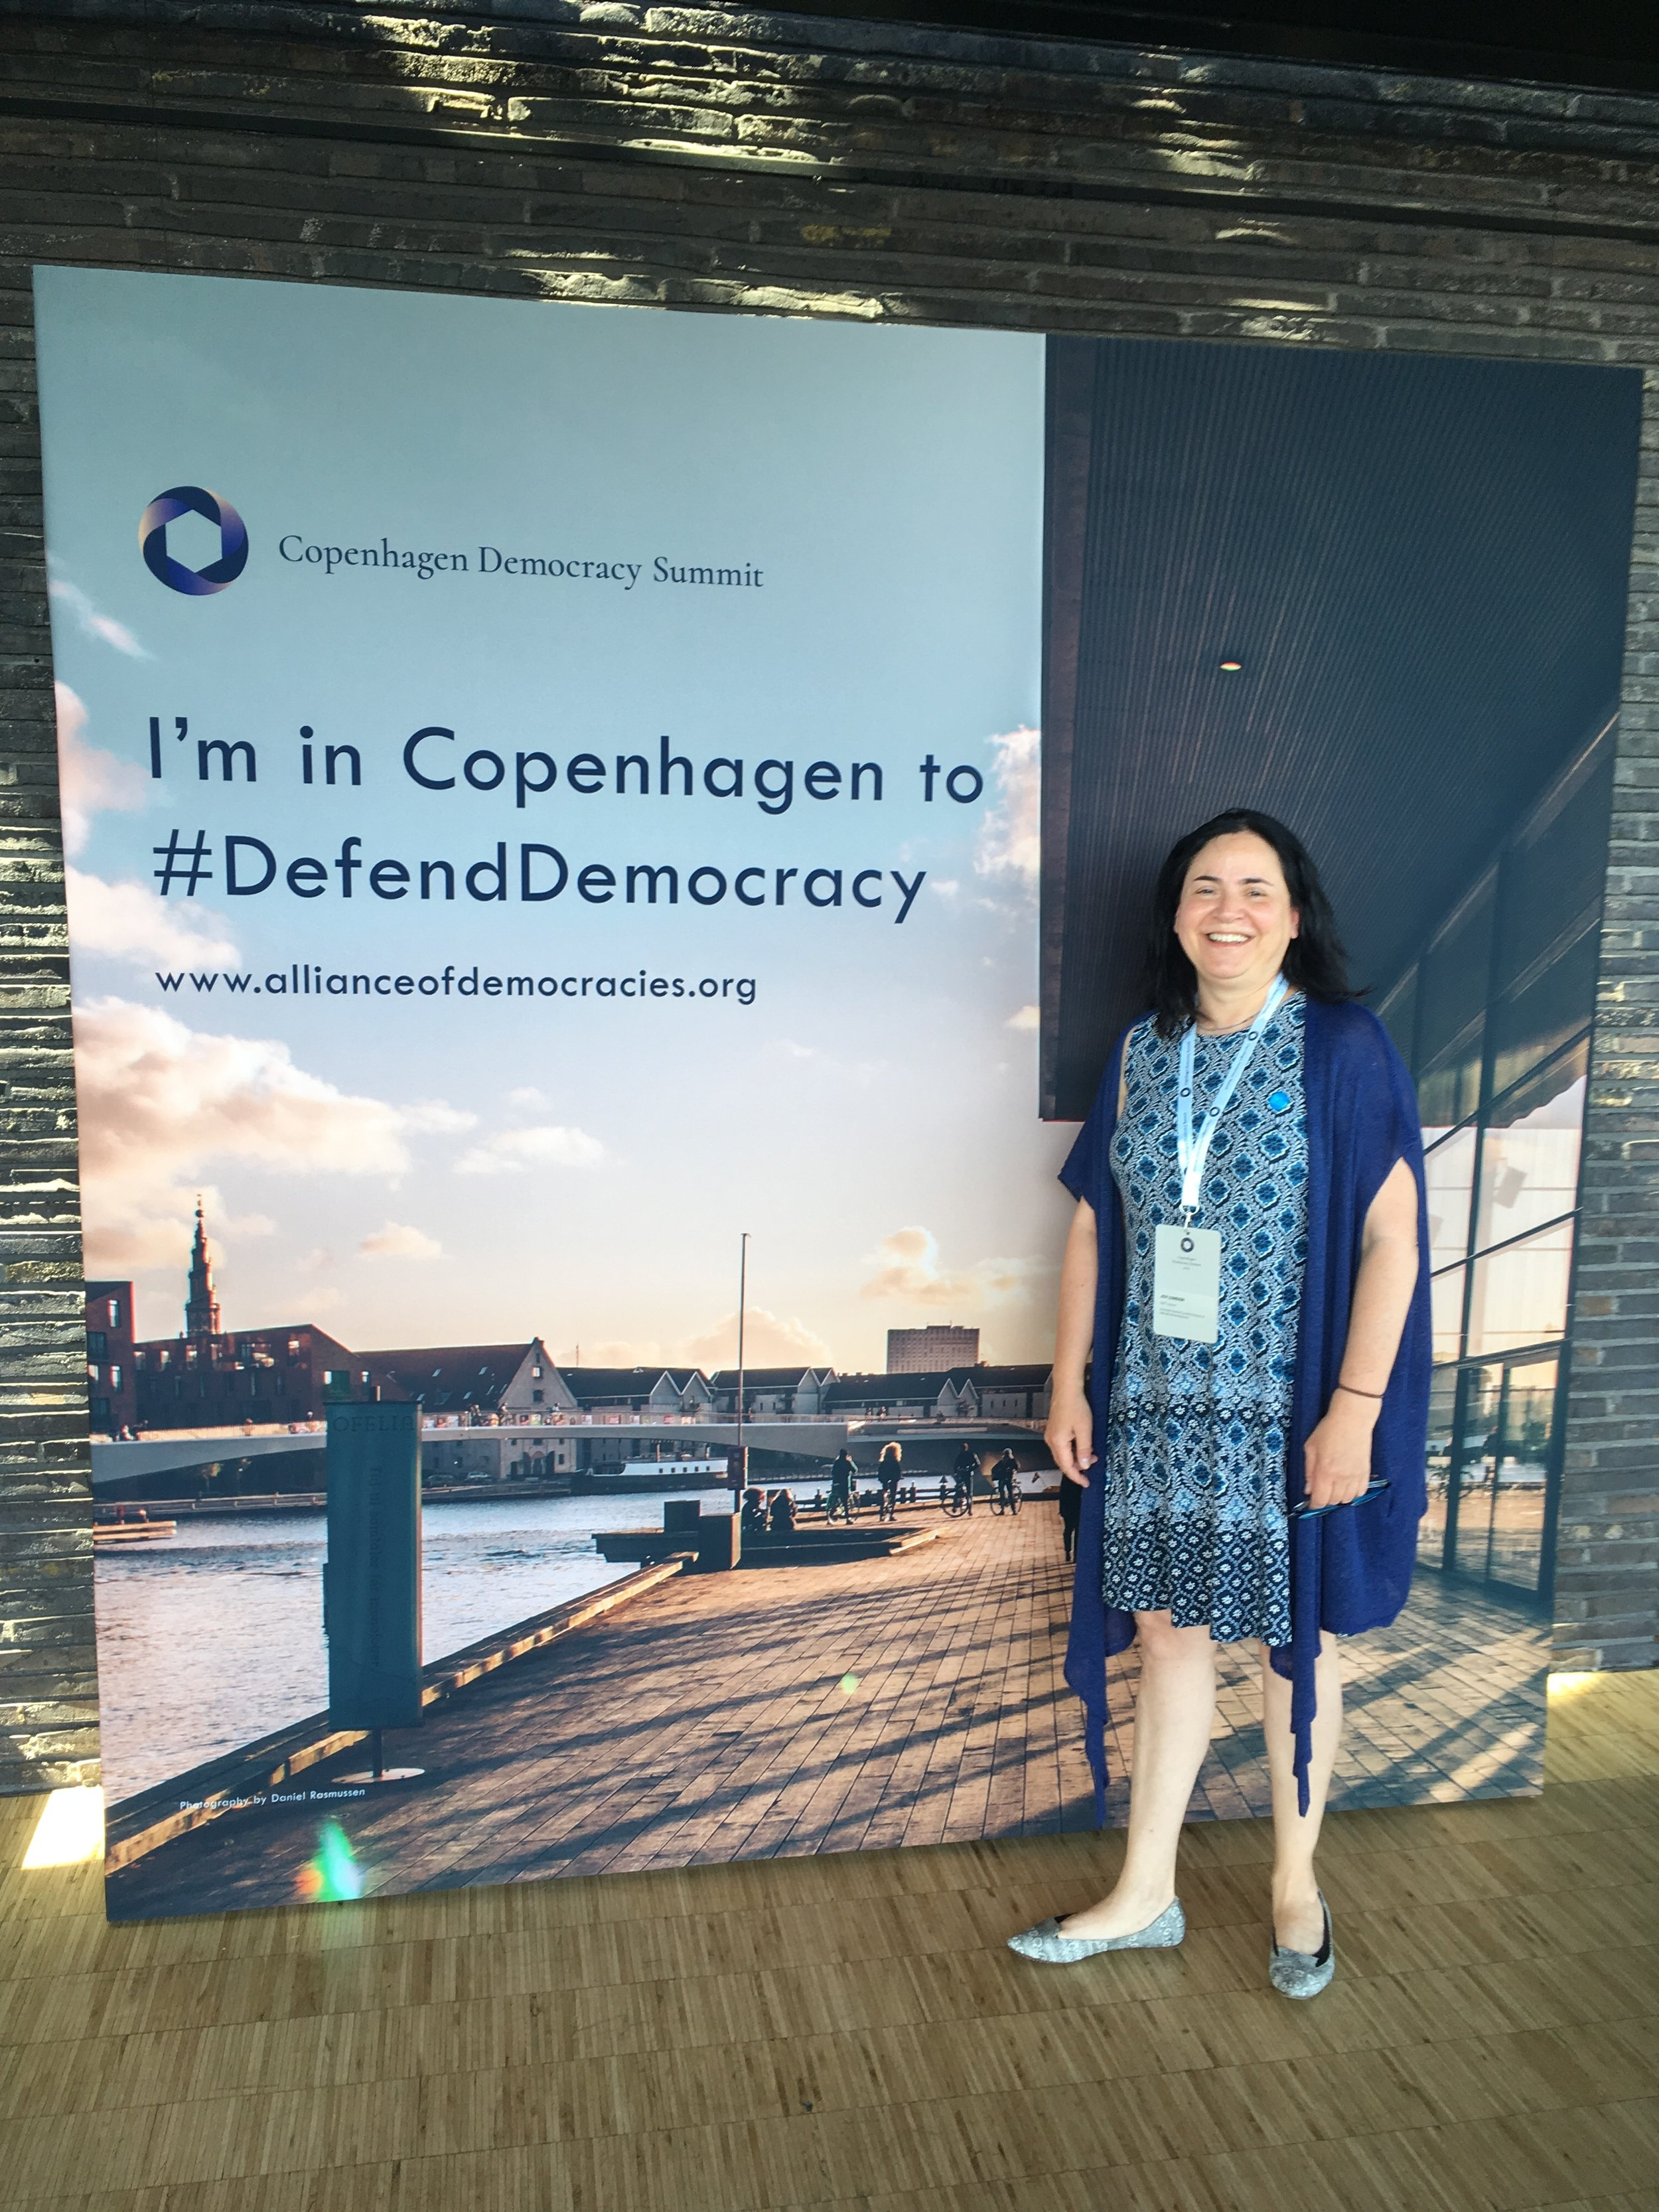 CopenhagenDemocracySummit_01_JLo.JPG